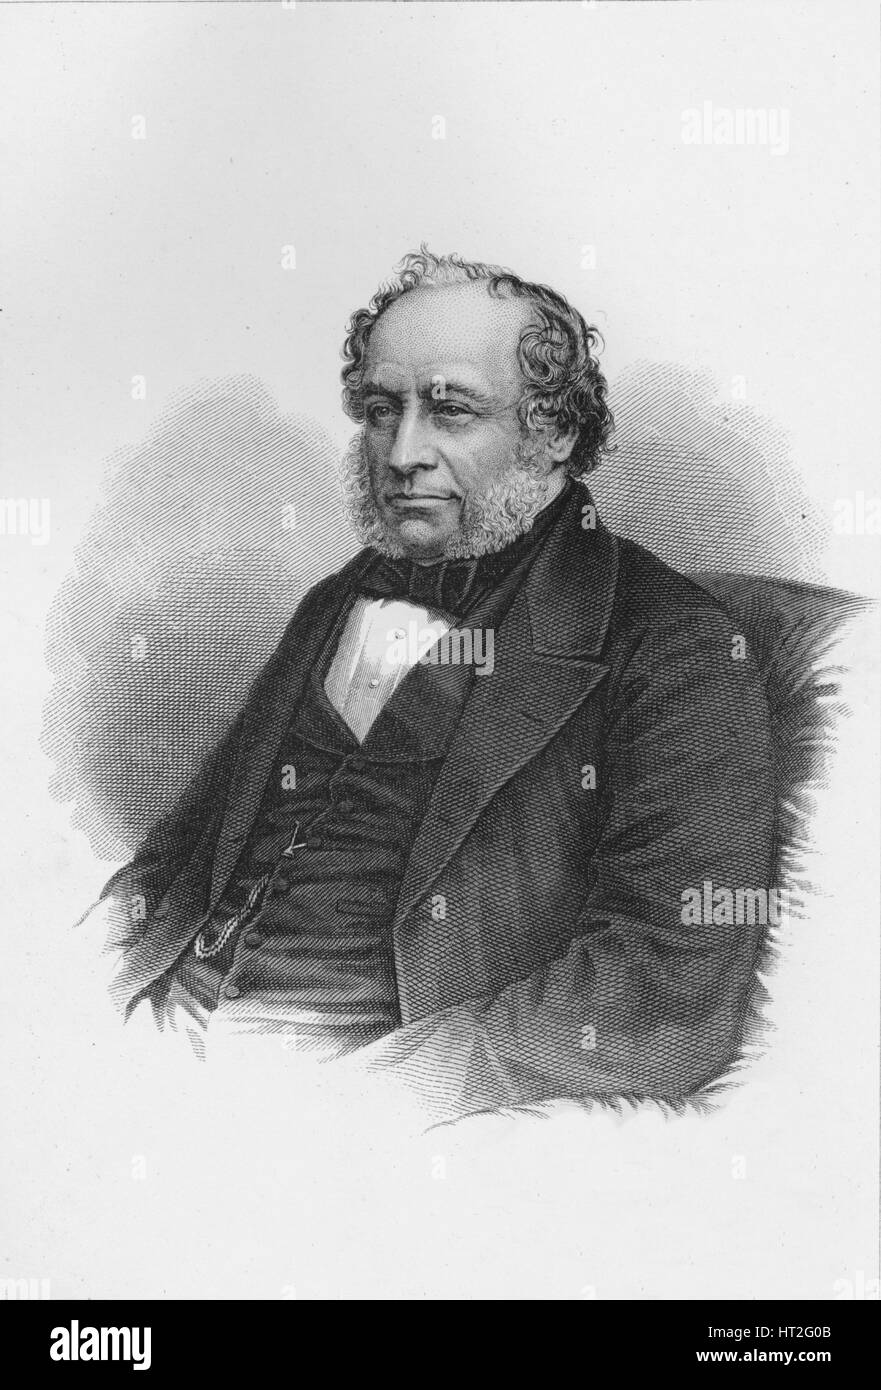 Sir Charles Barry, British architect, c1840 (1878). Artist: Unknown. - Stock Image